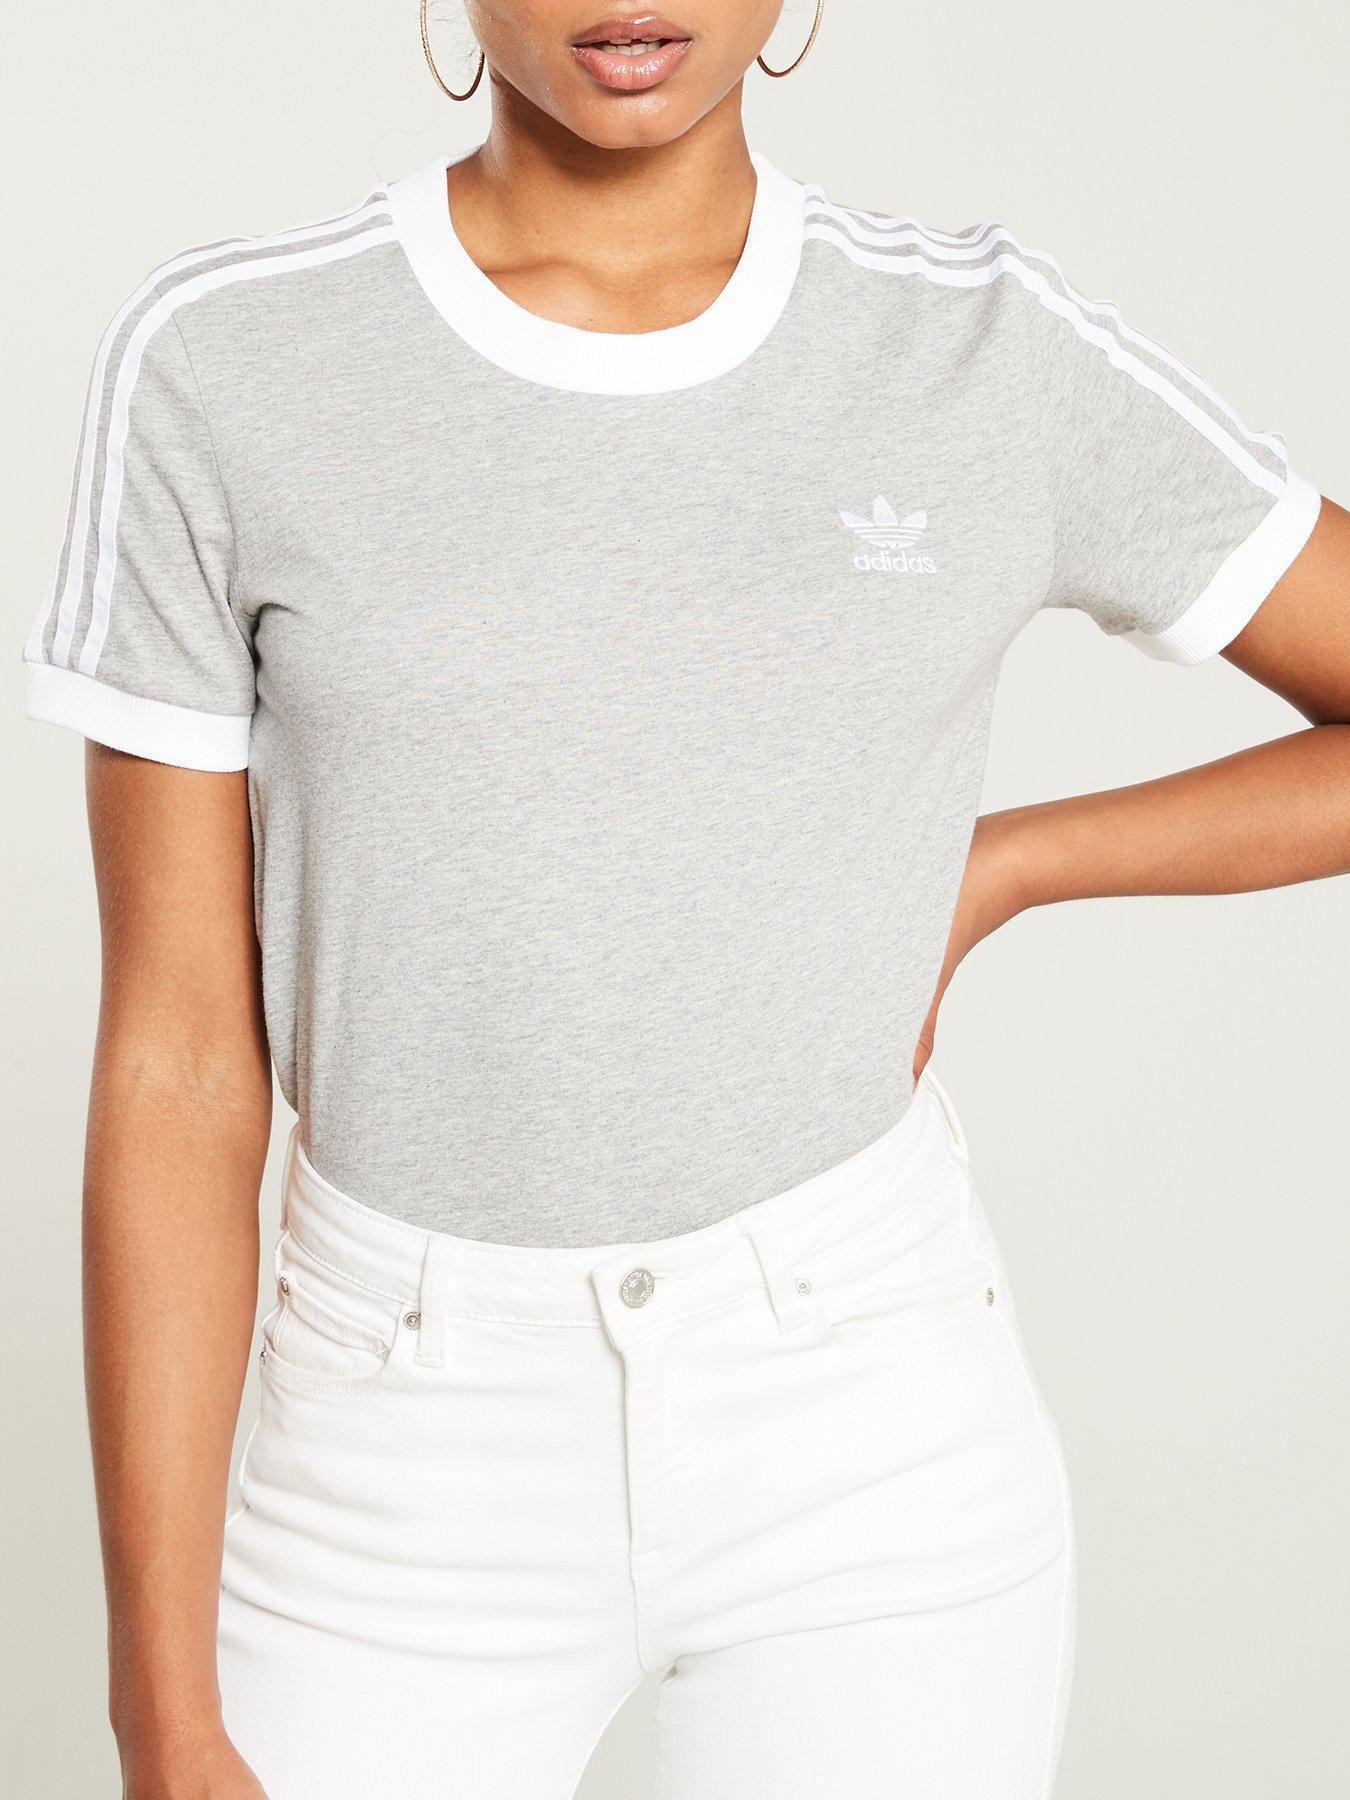 Orange Fanta Cropped Tee T-shirt Size Small BRAND NEW